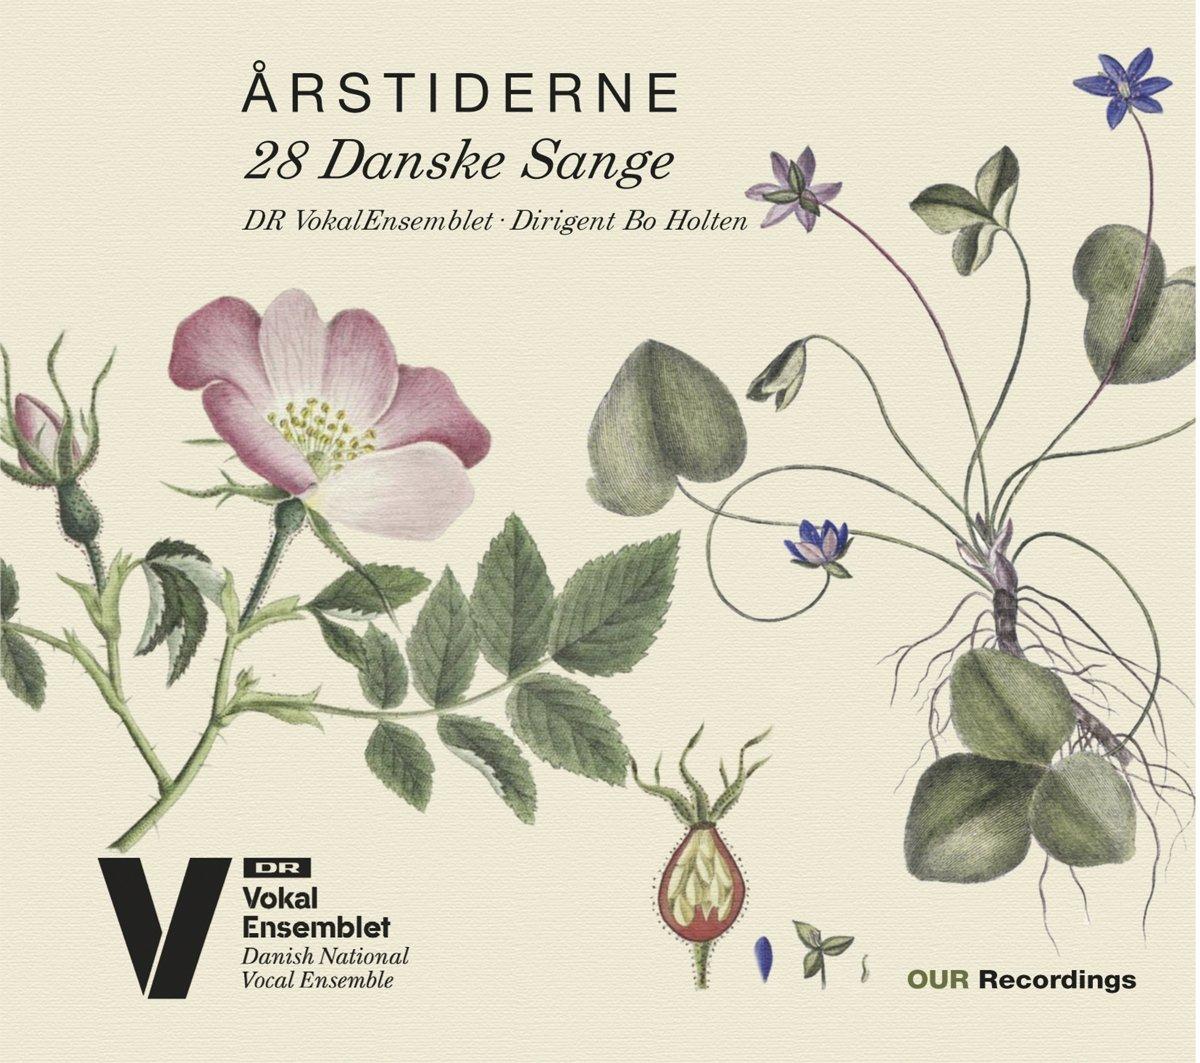 SACD : DANISH NATIONAL VOCAL ENSEMBLE - Arstiderne (Hybrid SACD)